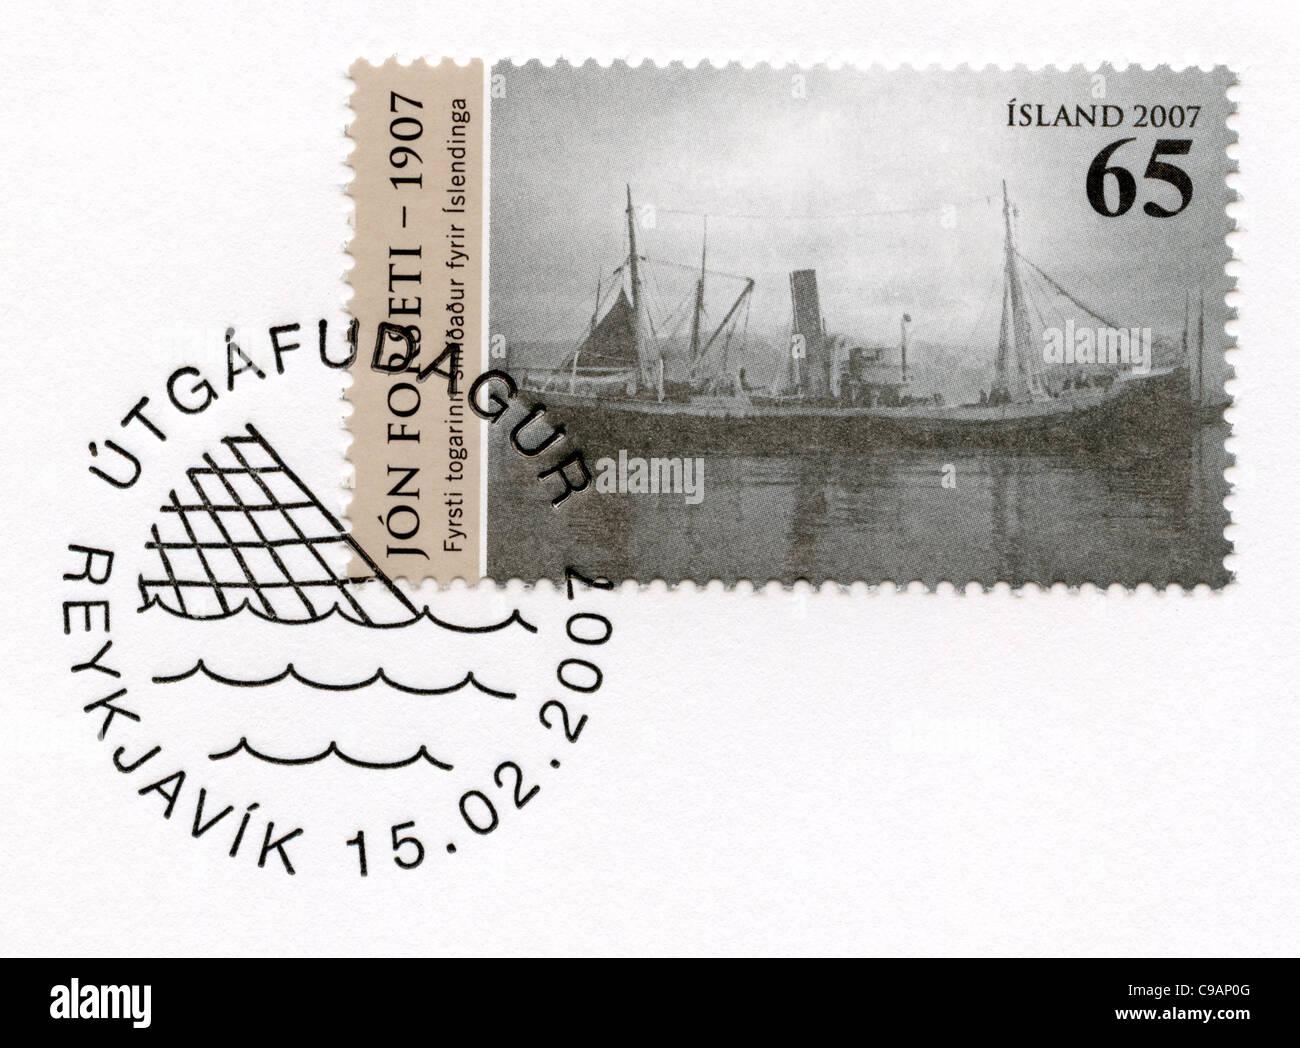 Iceland postage stamp - Stock Image